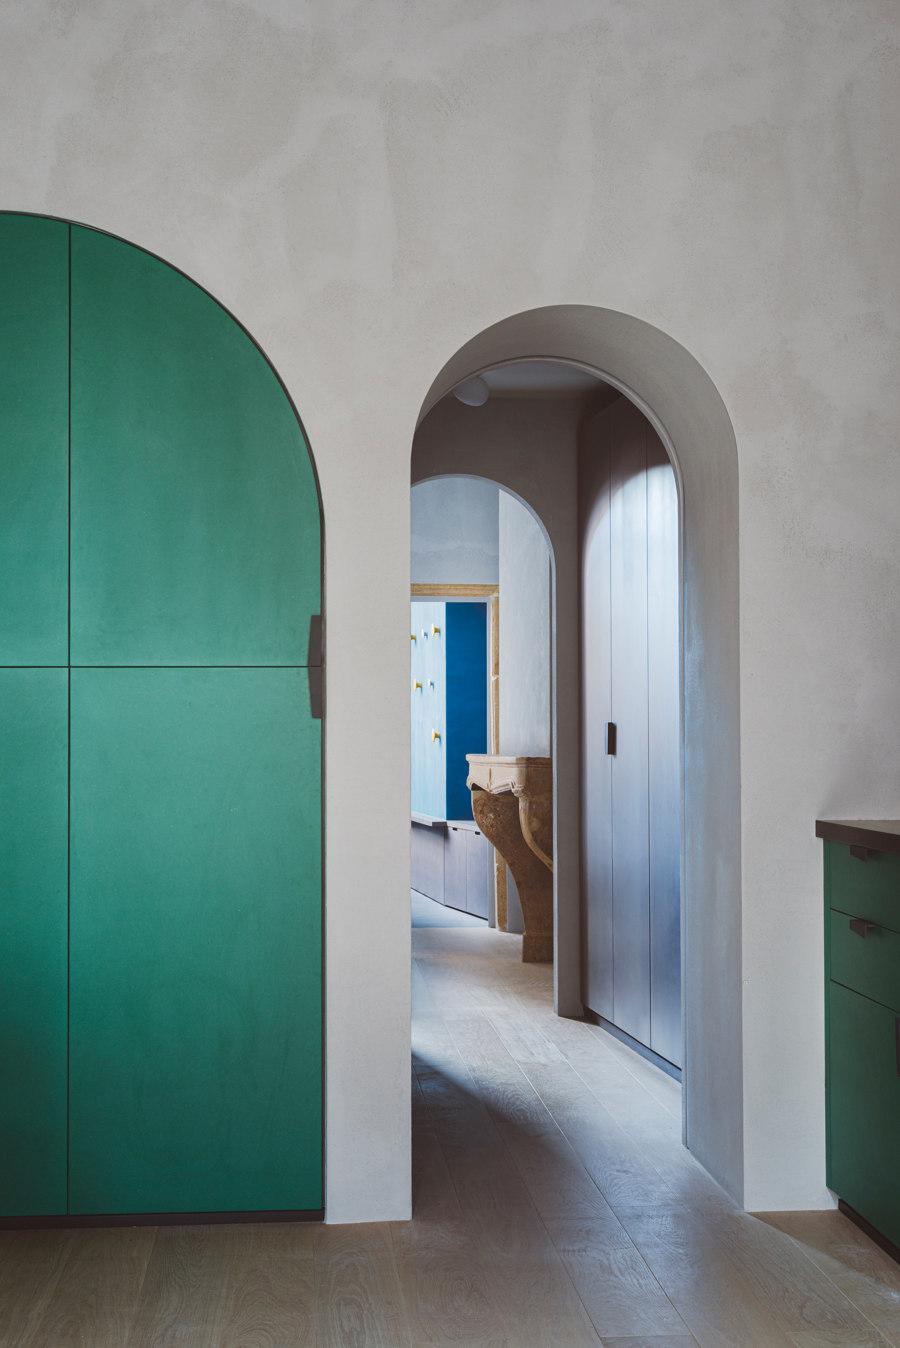 Apartment XVII by studio razavi architecture   Living space